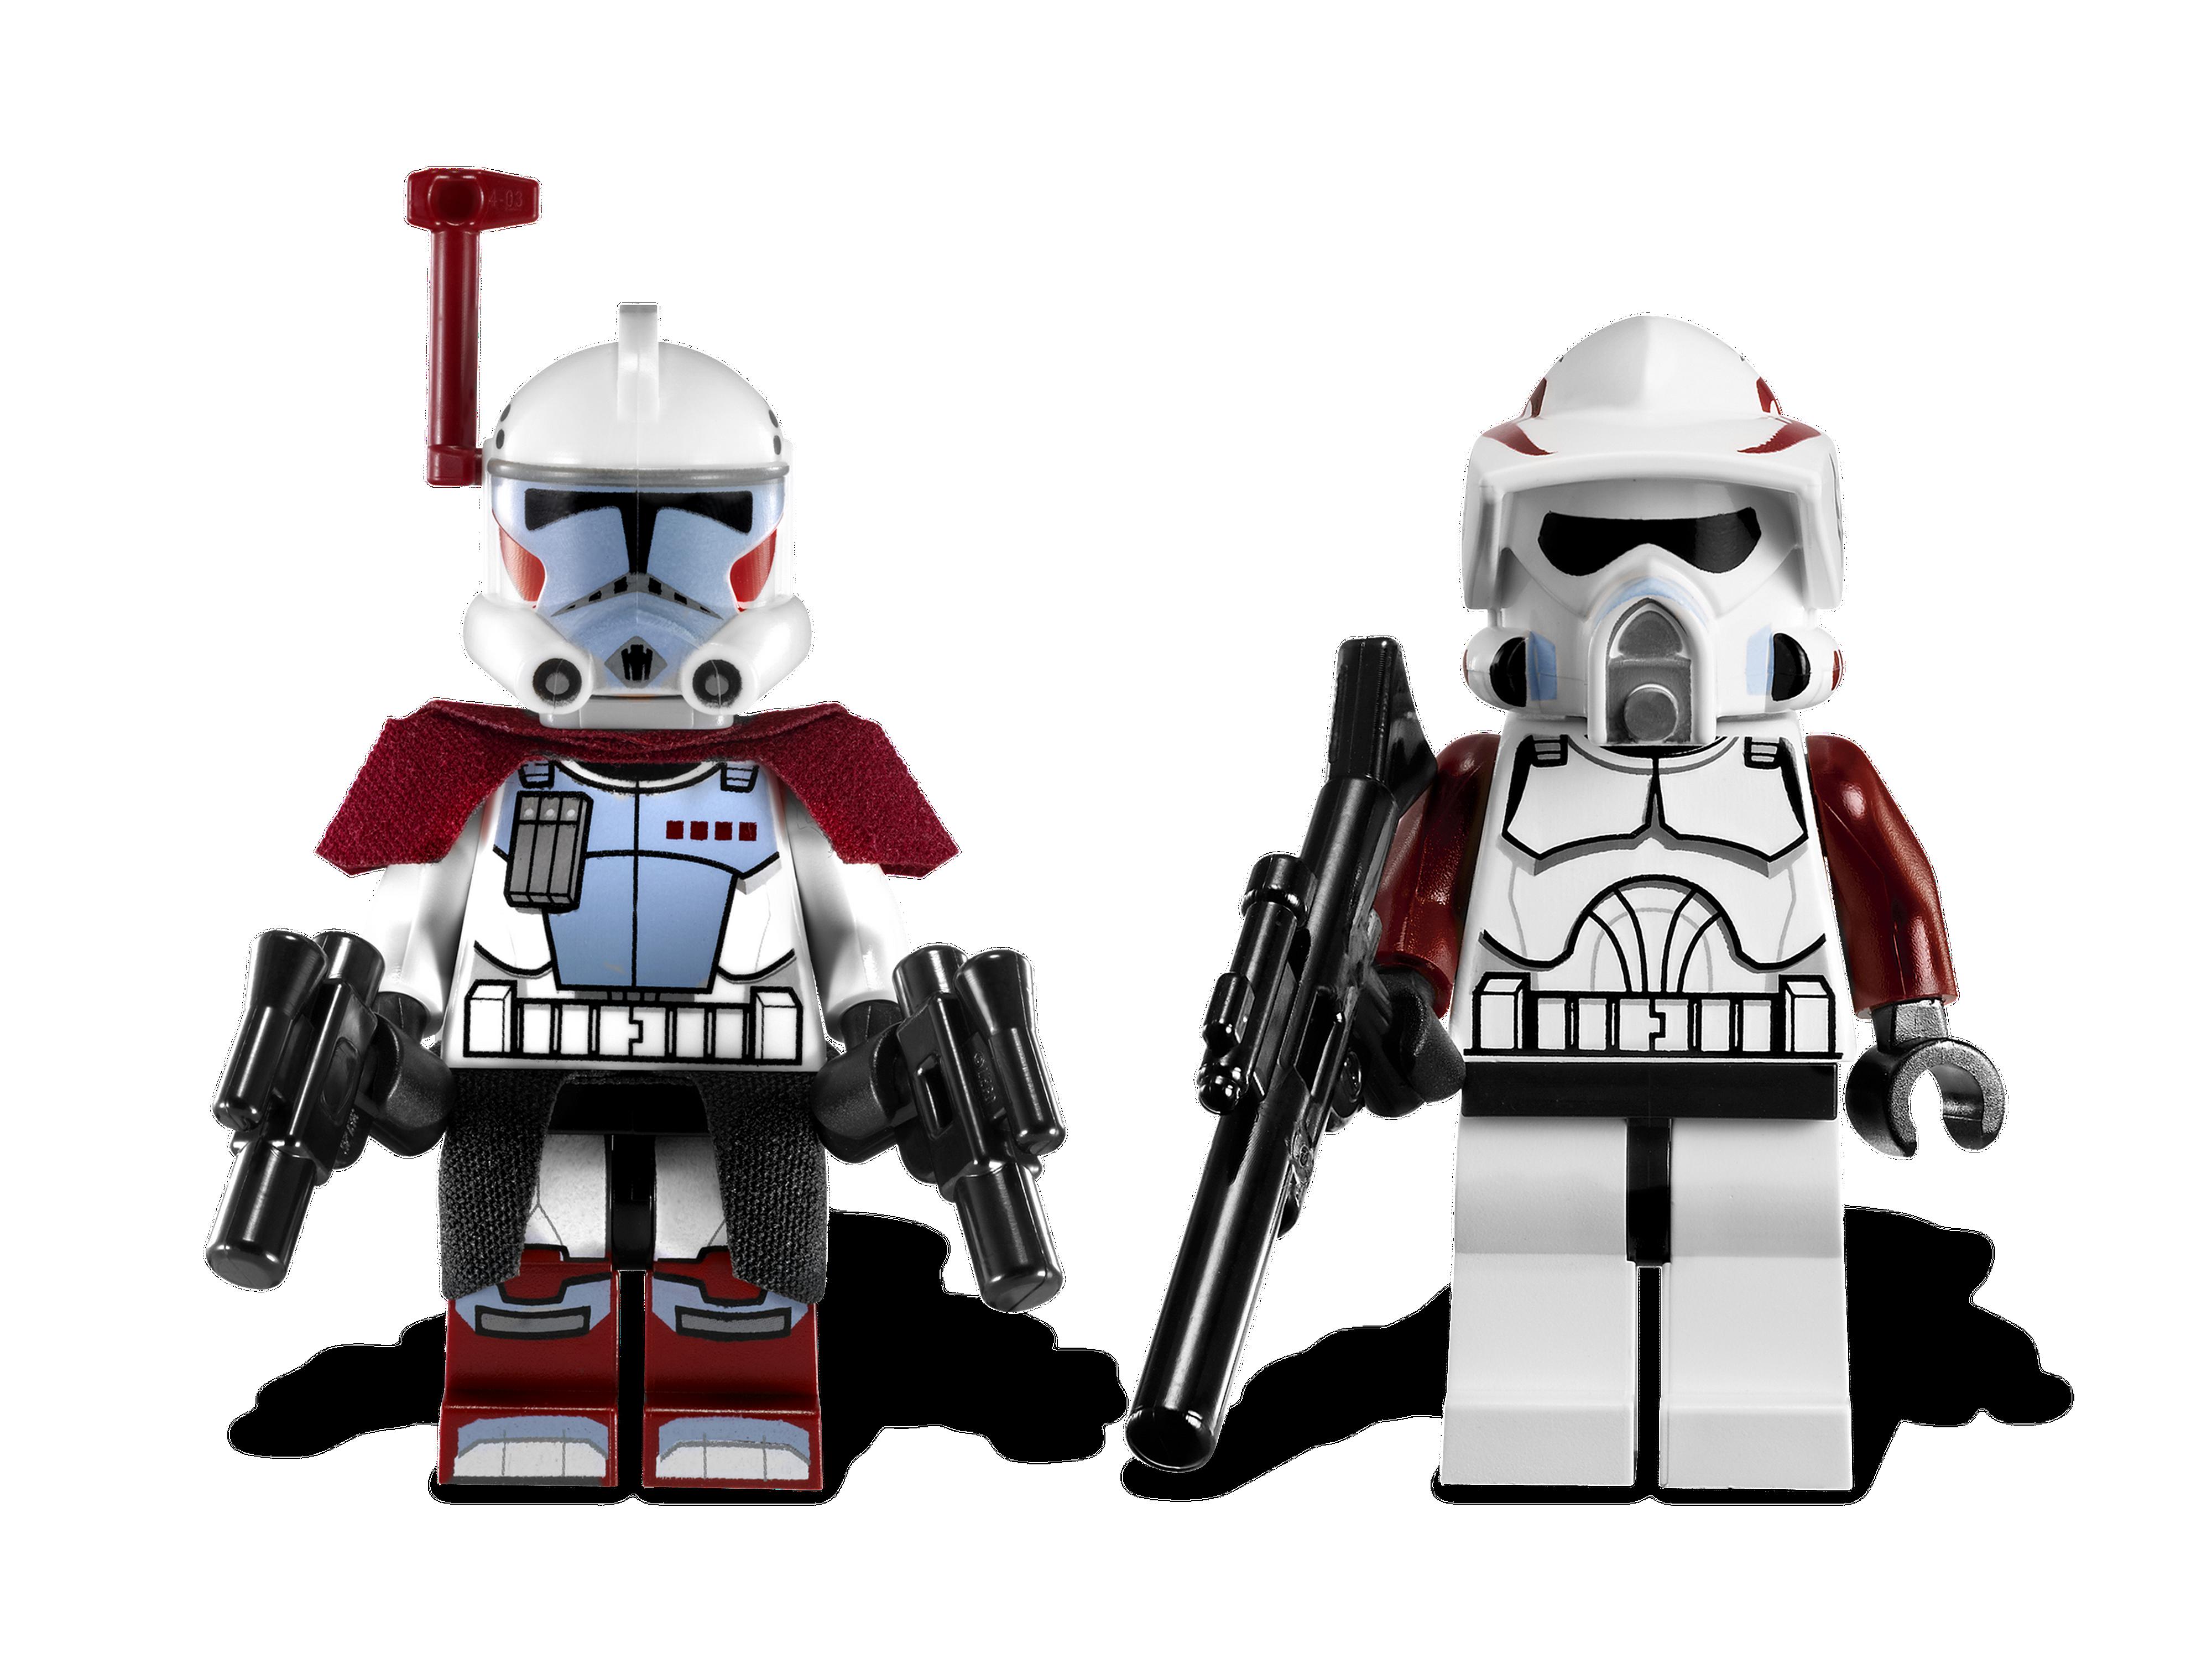 STAR WARS LEGO MINIFIGURE ARF CLONE TROOPER LOT+RIFLE SET 9488 7913 BATTLE PACK